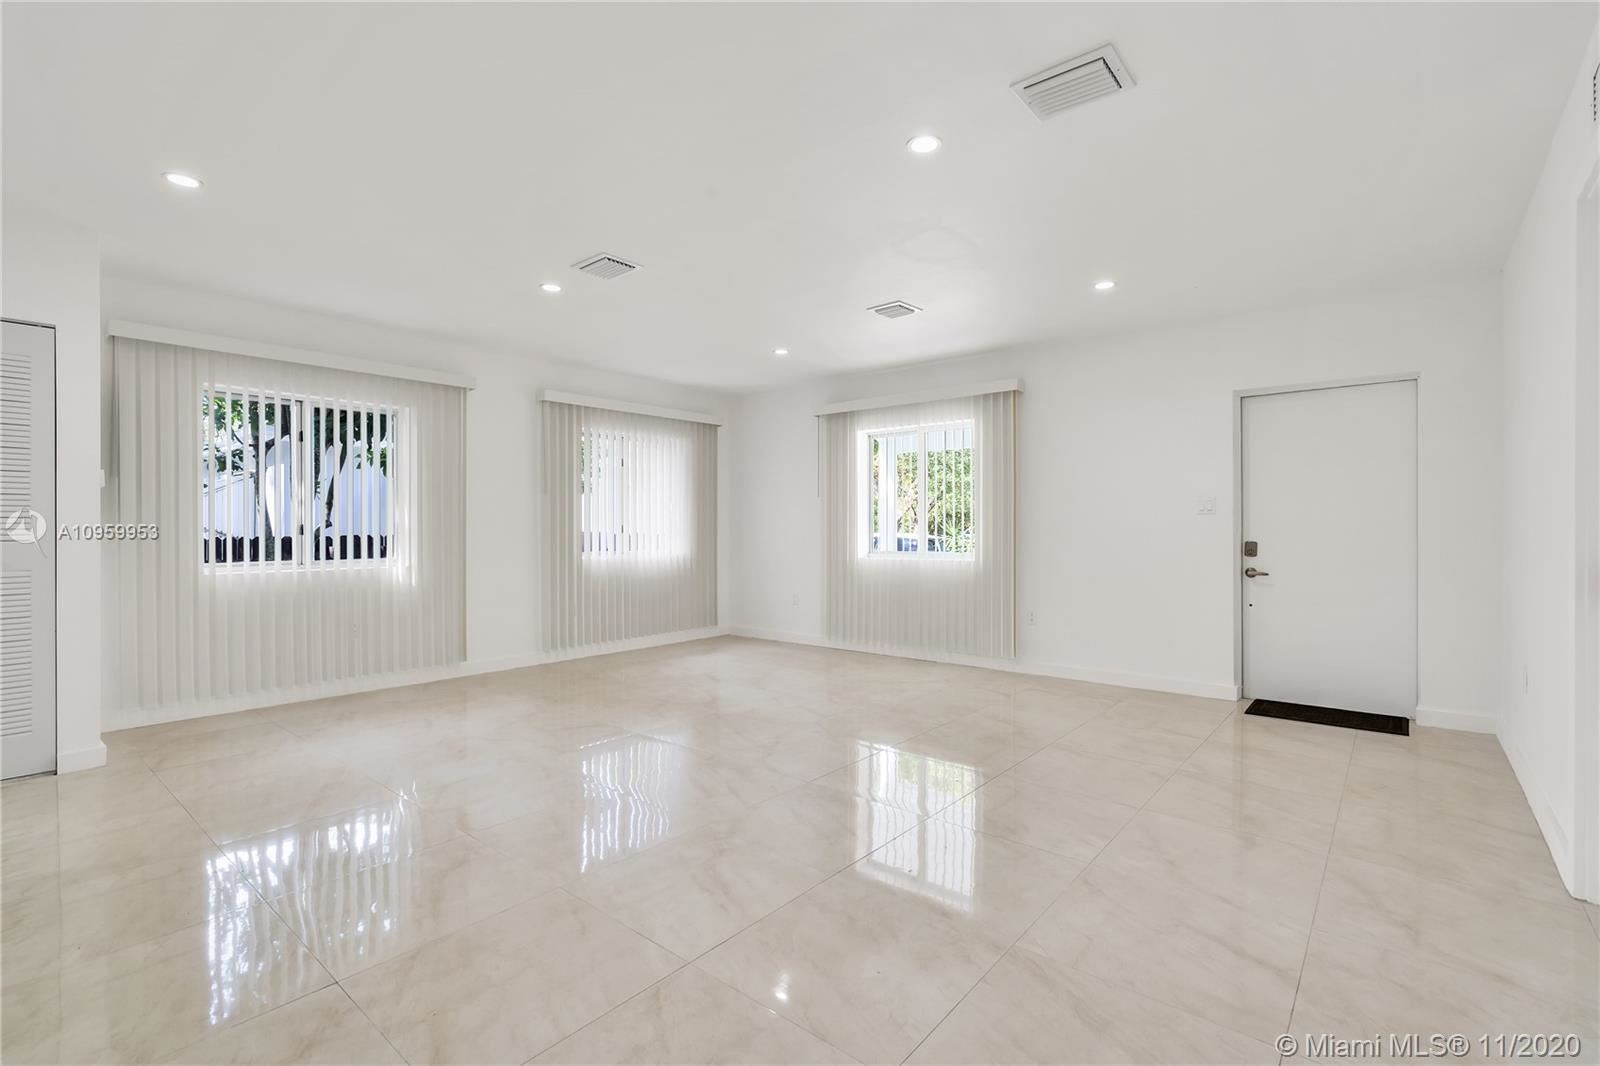 Photo of 970 NE 132nd St, North Miami, FL 33161 (MLS # A10959953)